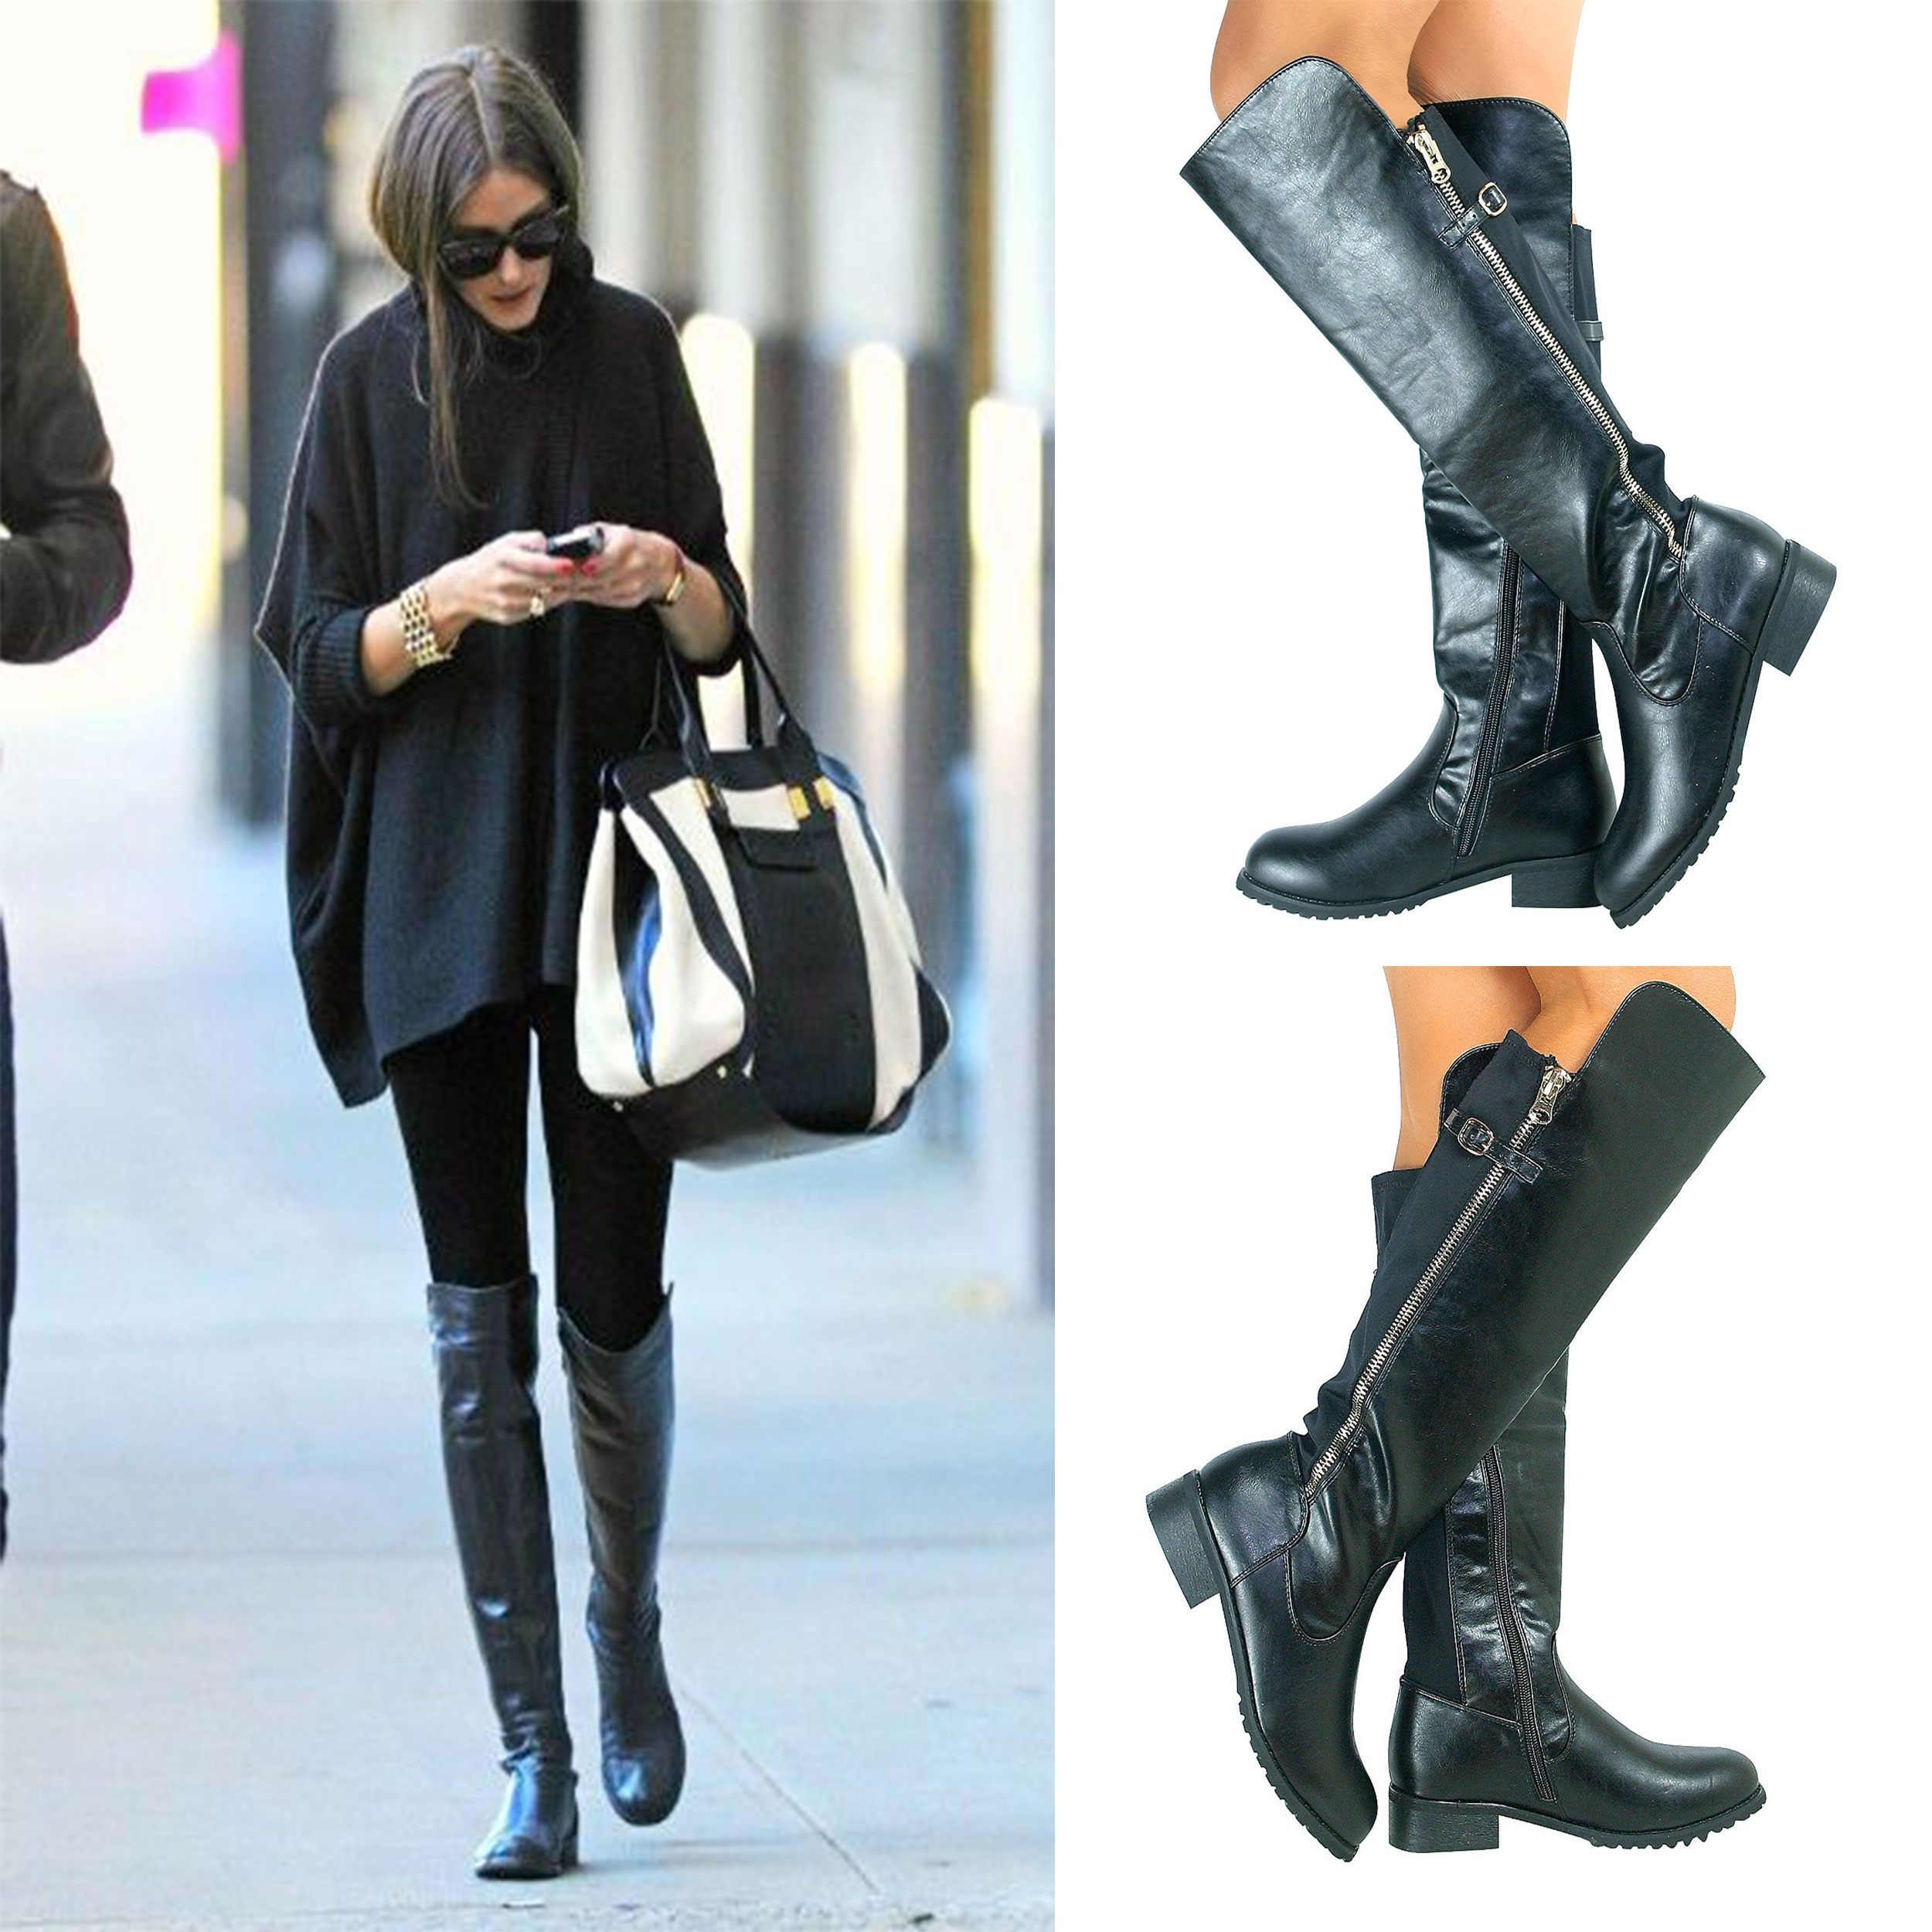 Black Womens Riding Boots | Fashion Boots